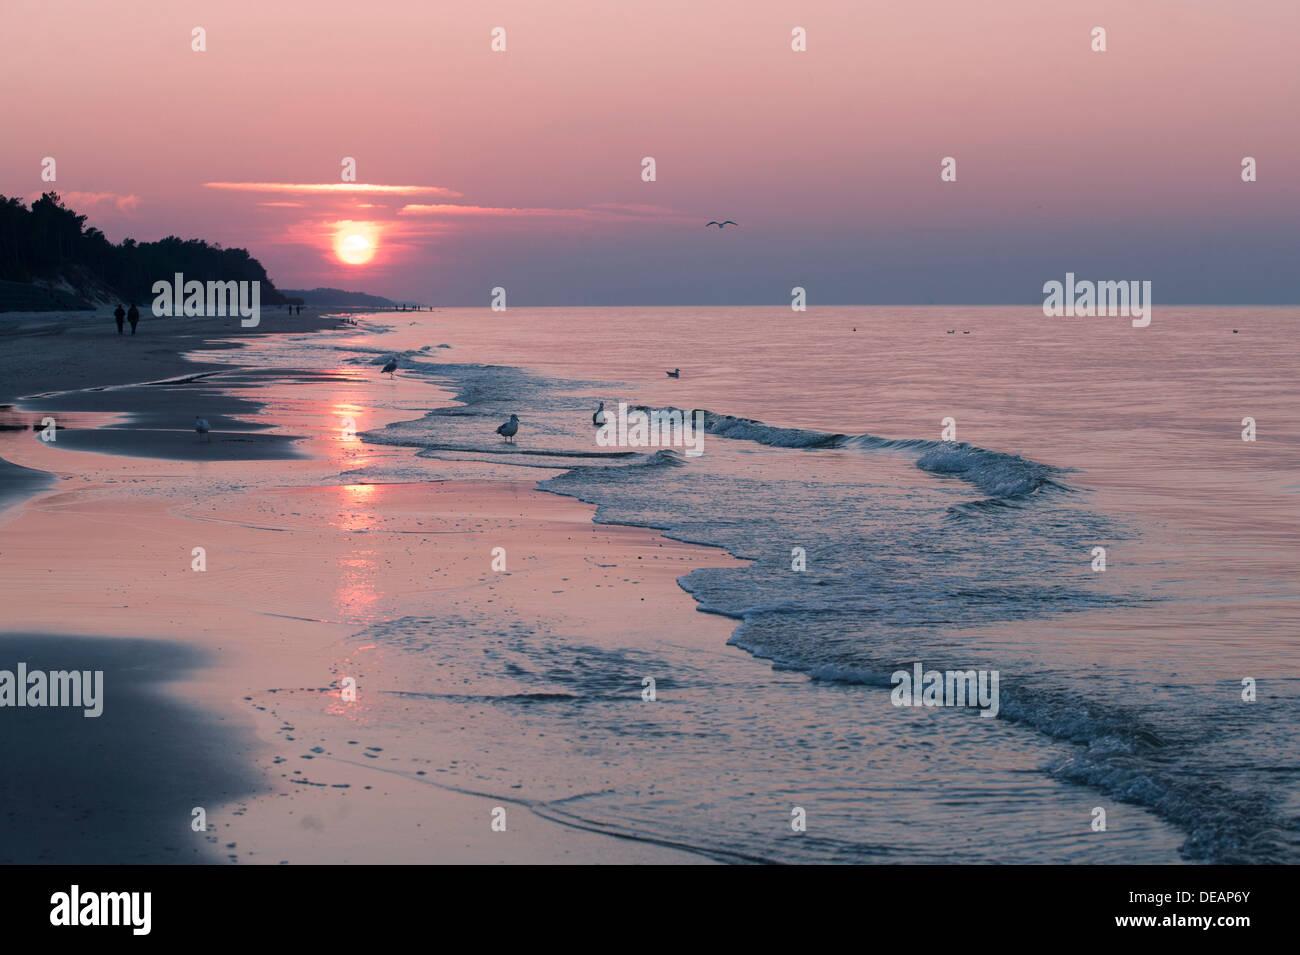 baltic coast stockfotos baltic coast bilder alamy. Black Bedroom Furniture Sets. Home Design Ideas